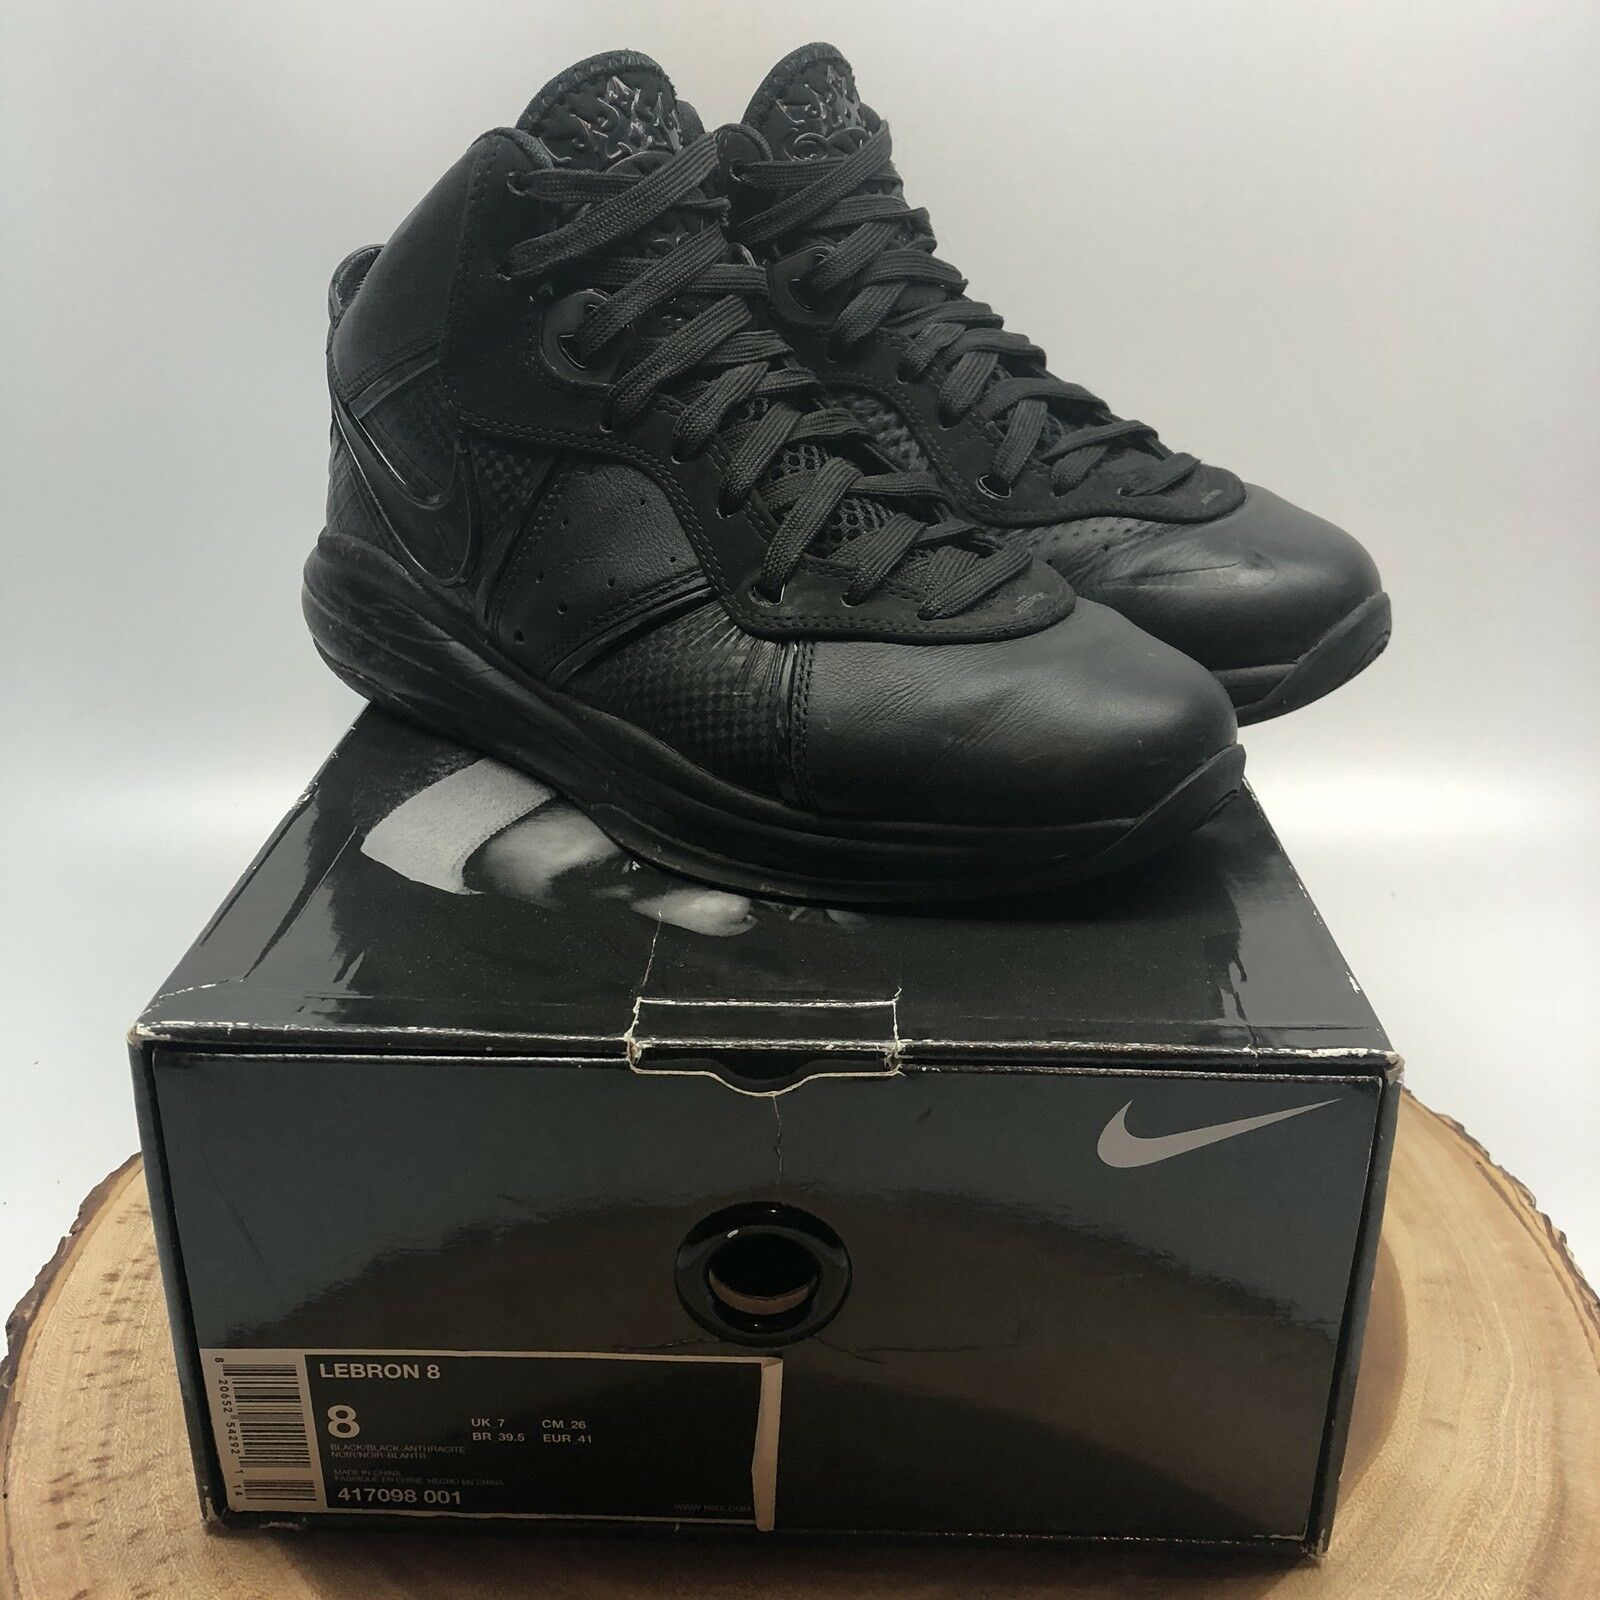 online store 3b90b 34f6c Nike Lebron 8 Blackout Black Basketball Shoes 417098 417098 417098 001  Jordan Penny Foamposite 1221bf